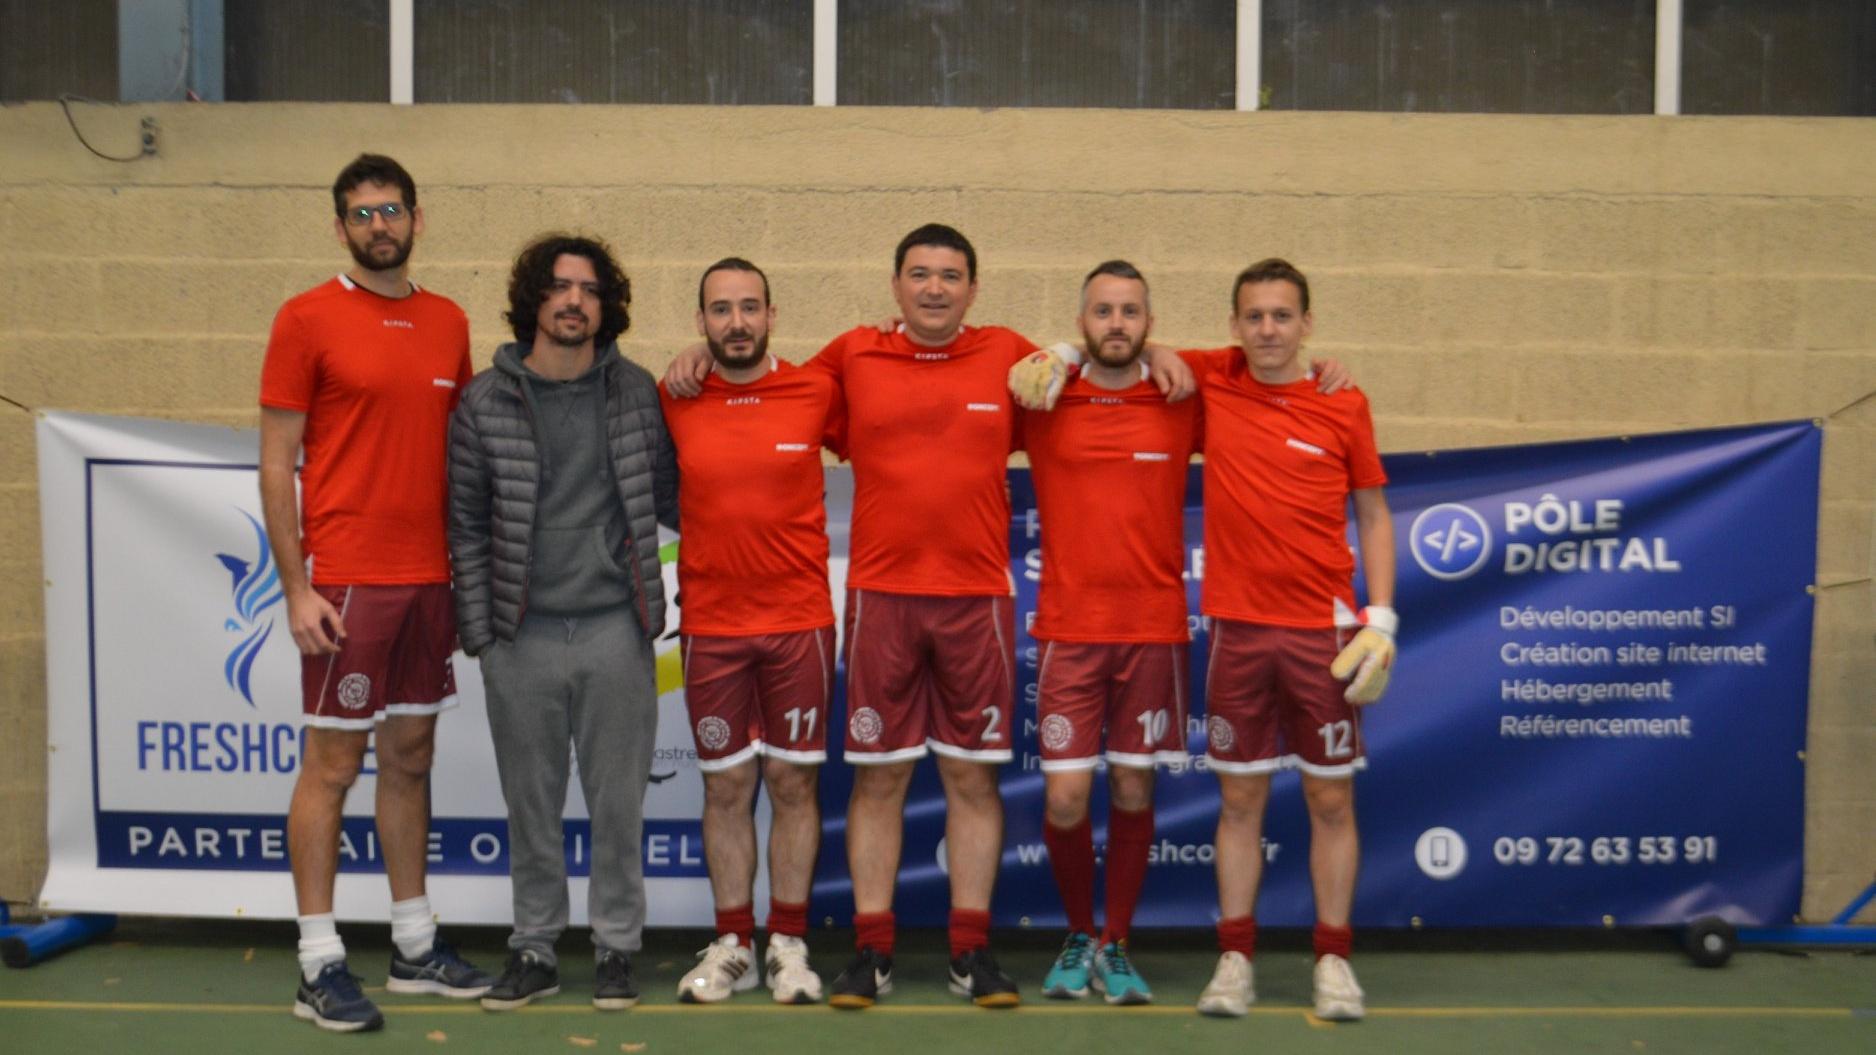 Valeur du sport - Équipe BeProject futsal